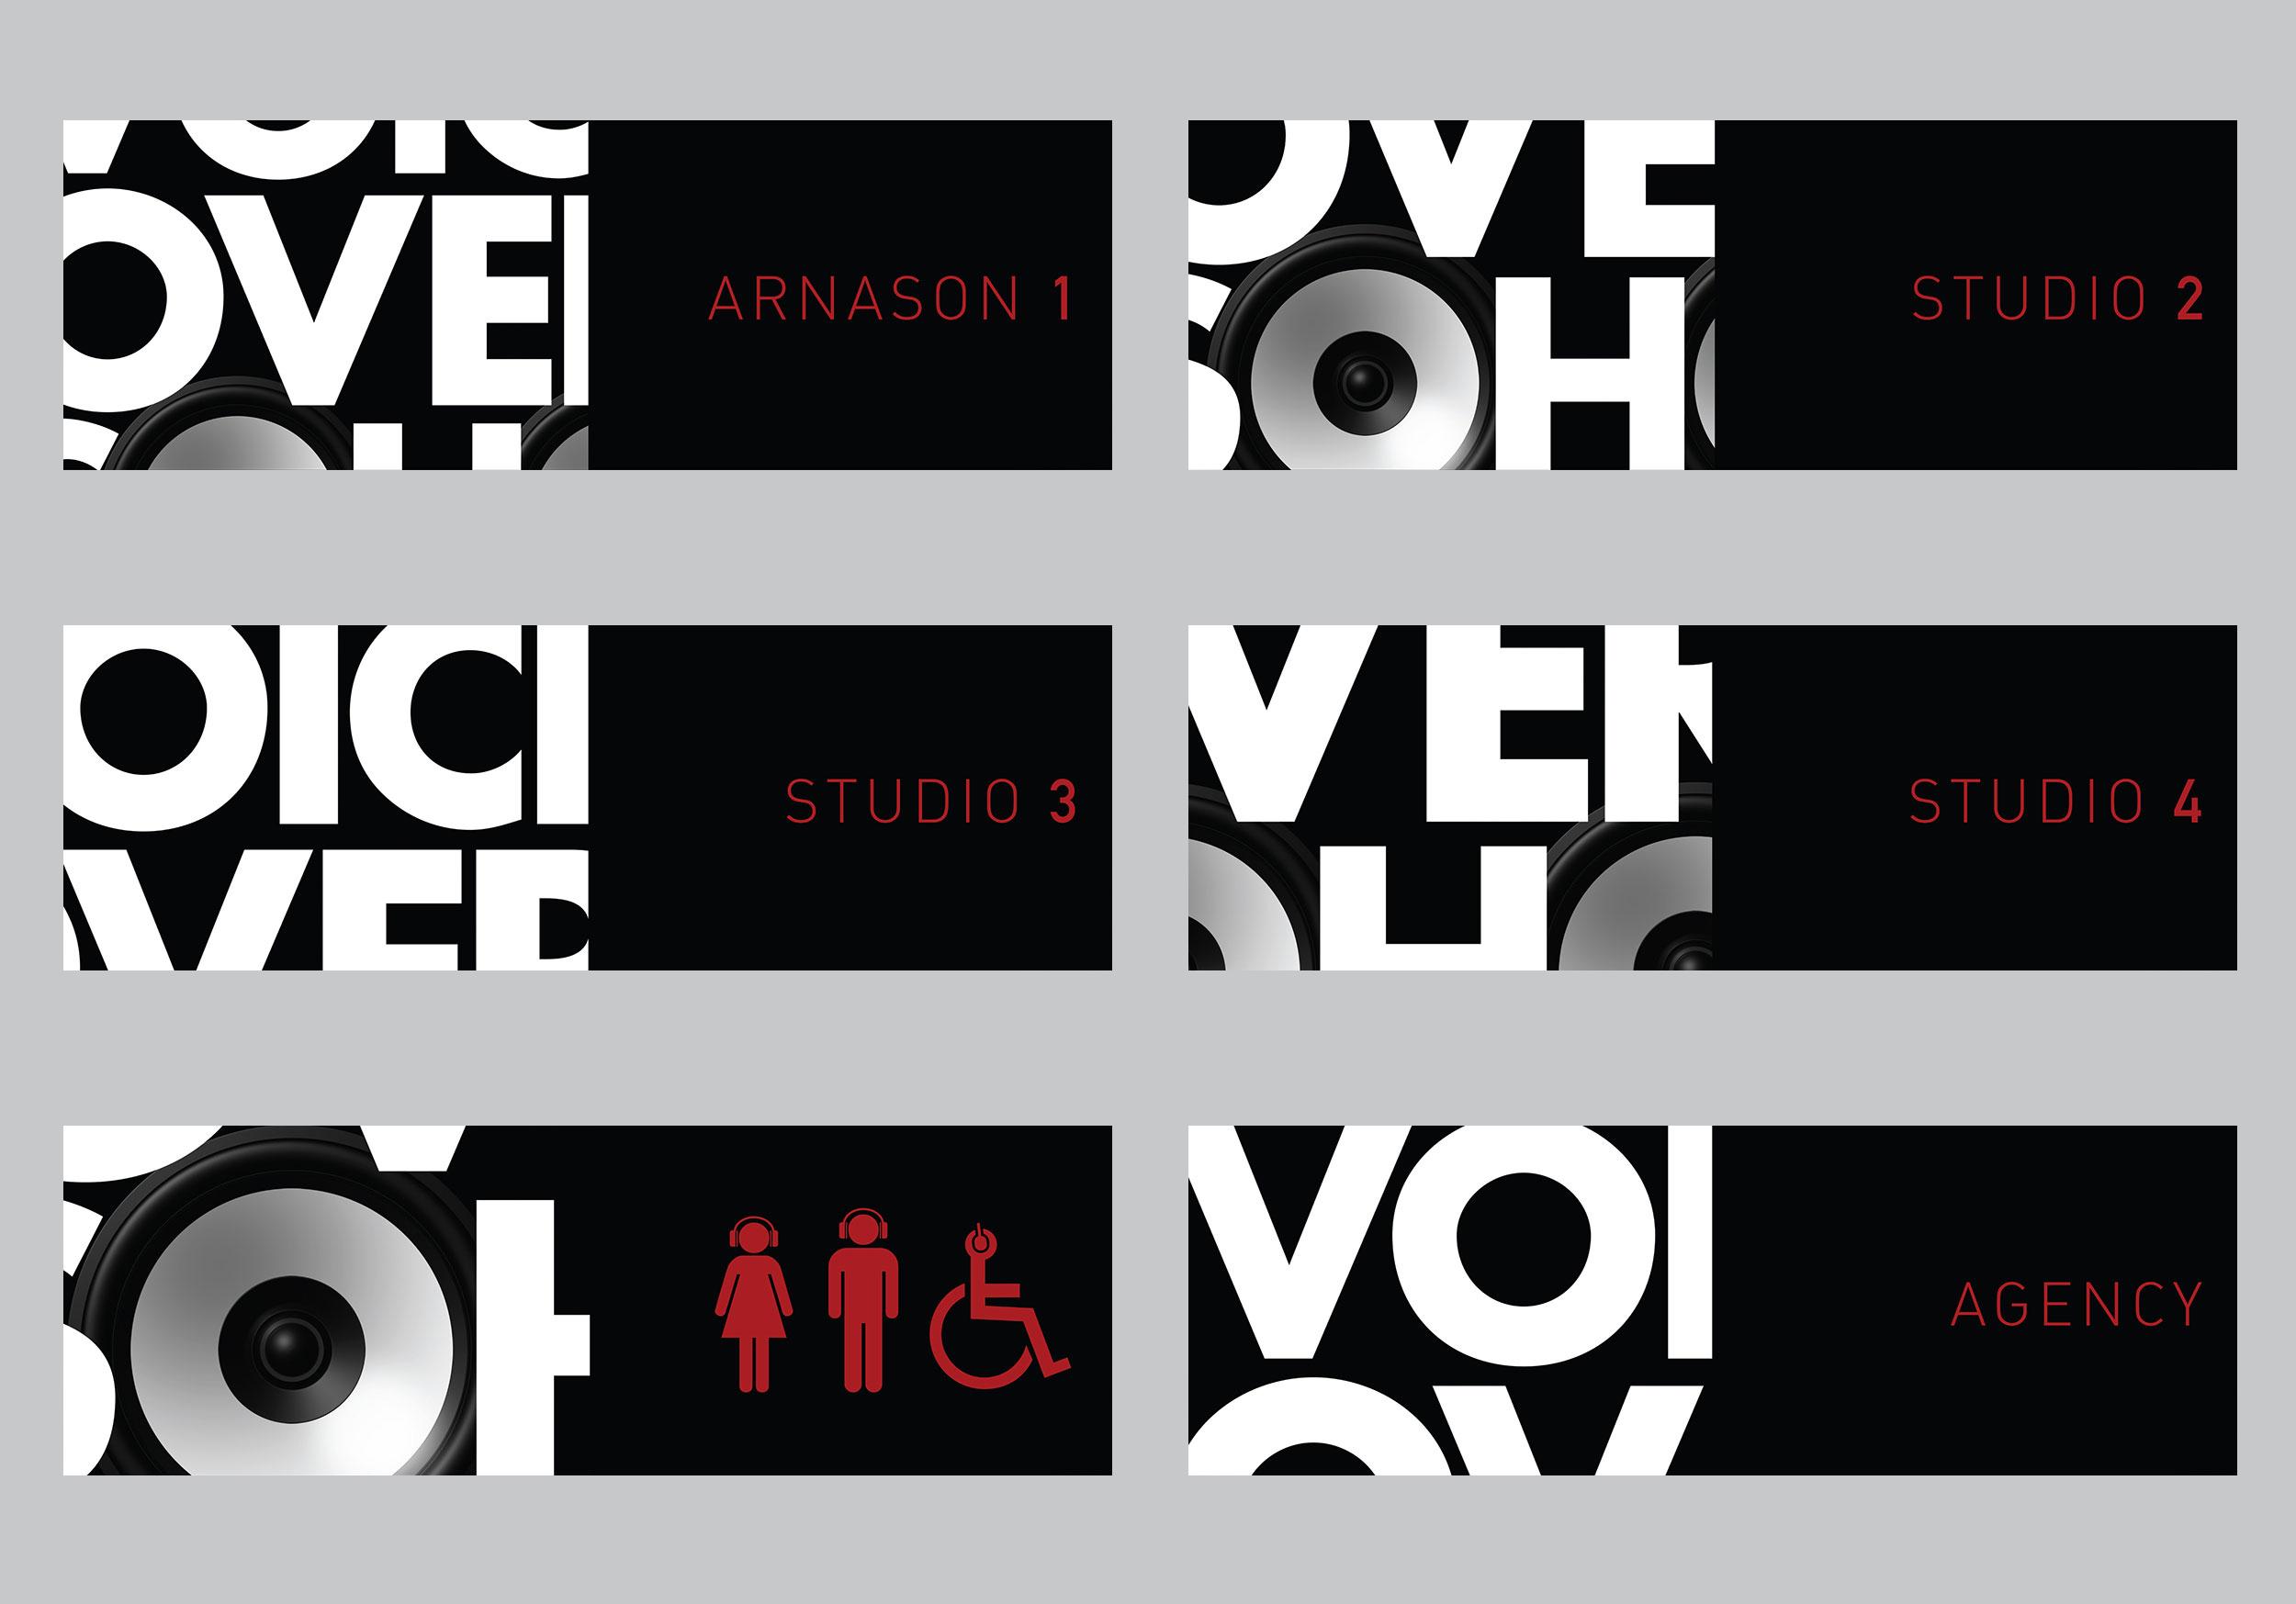 We are Noisy - Voiceover Soho - 04-Signage1